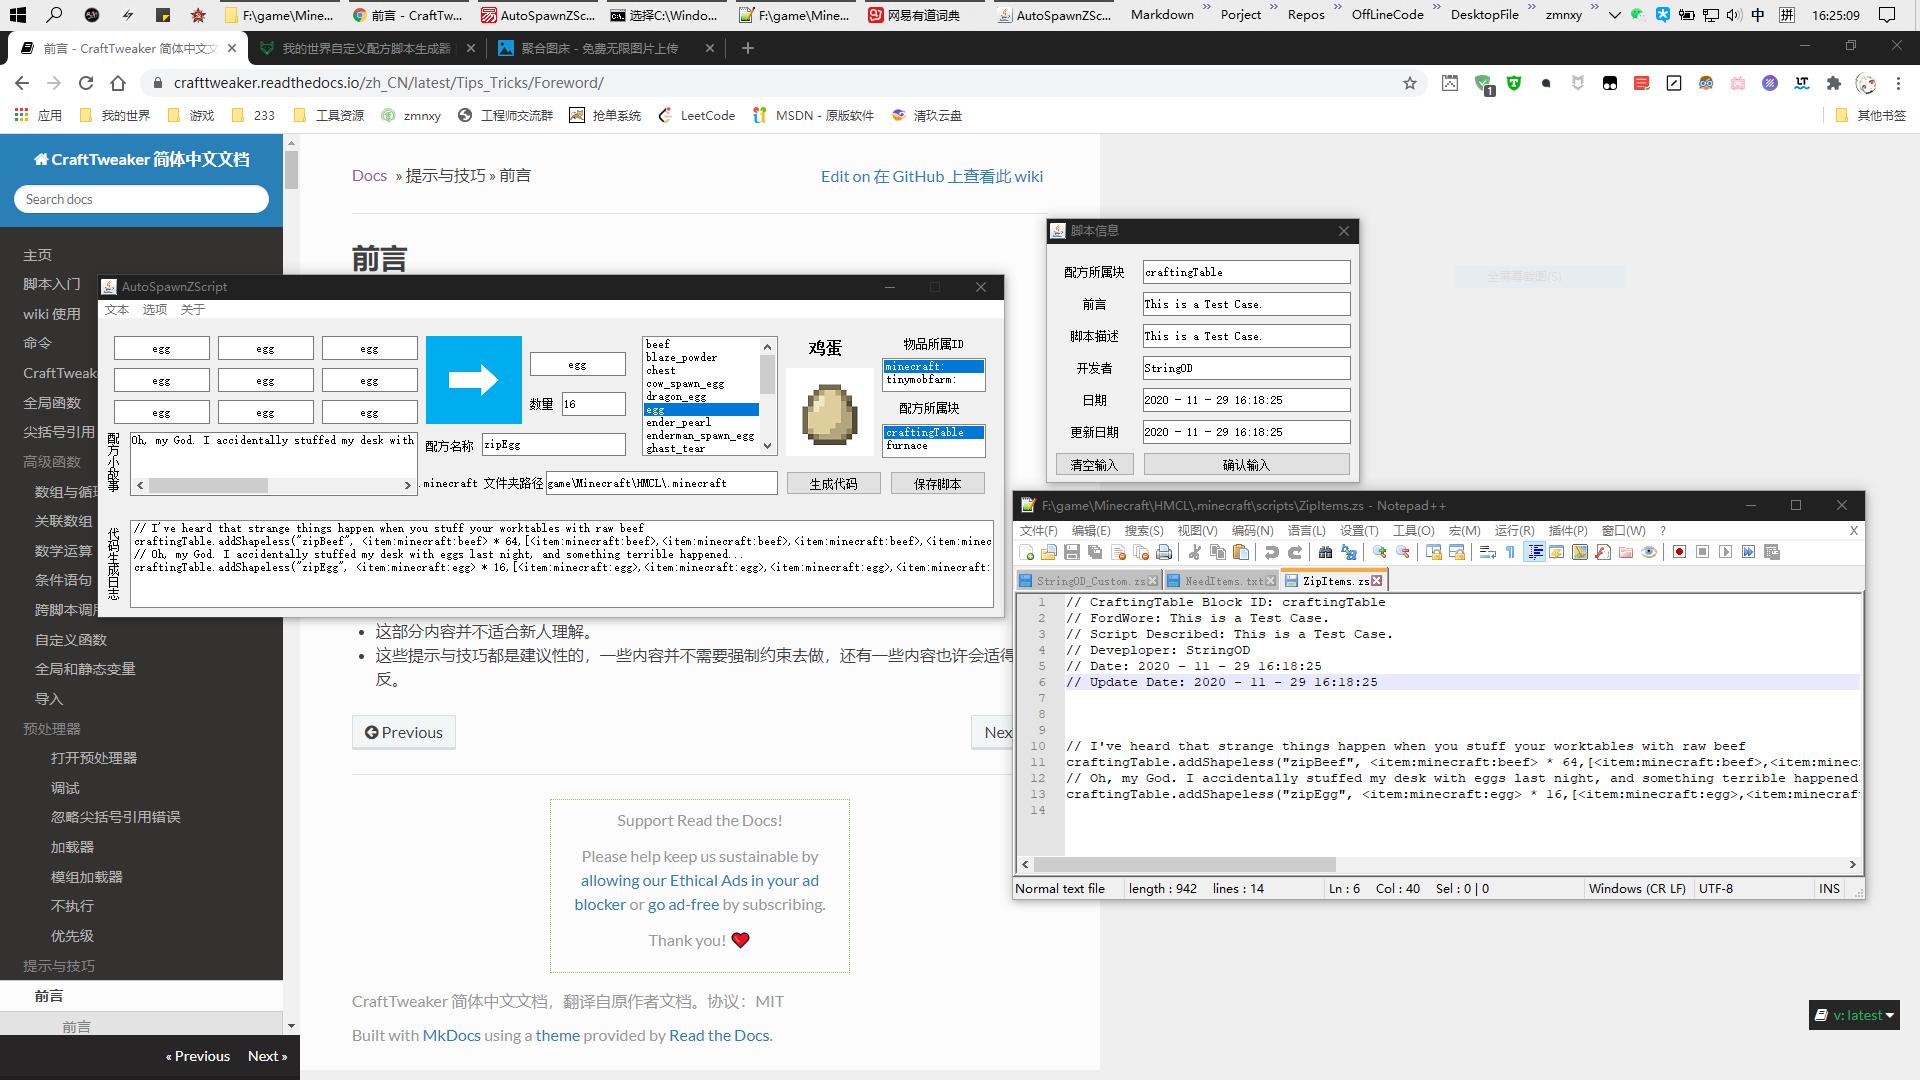 AutoSpawnZScript - v0.5